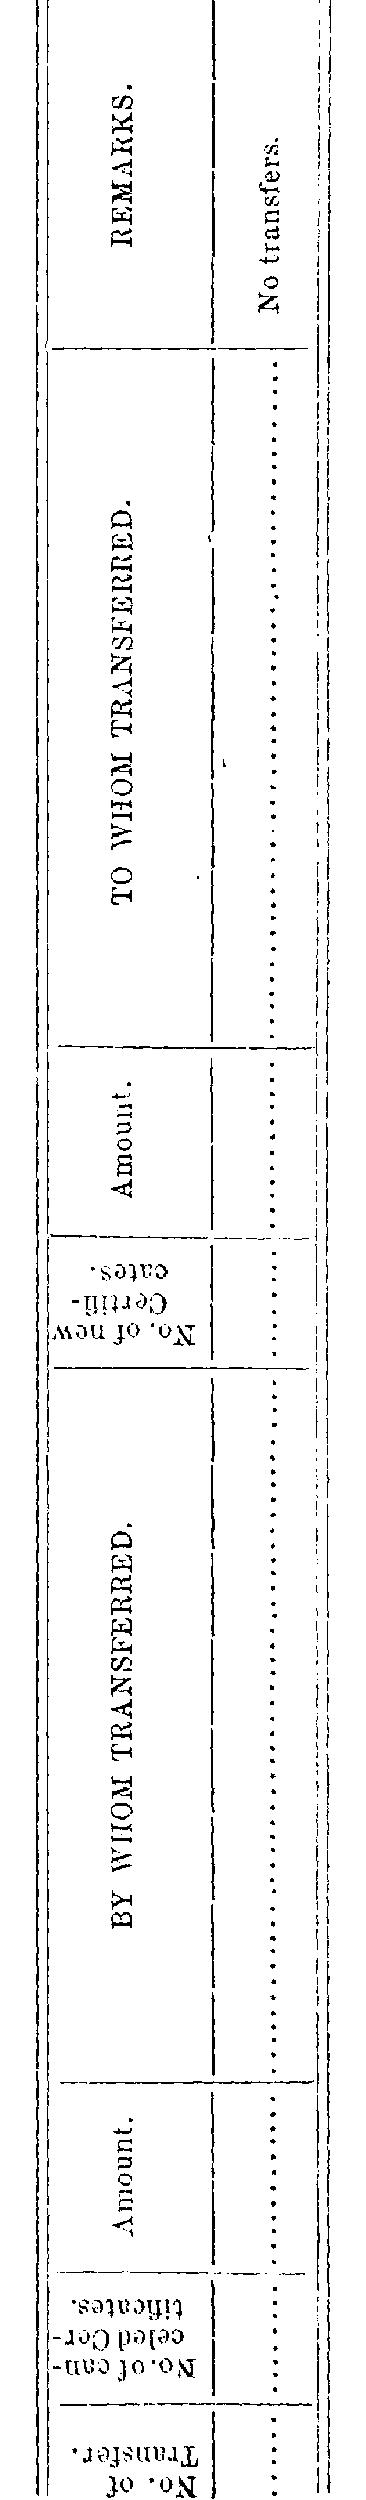 [merged small][subsumed][subsumed][subsumed][subsumed][merged small][merged small][merged small][merged small][graphic]